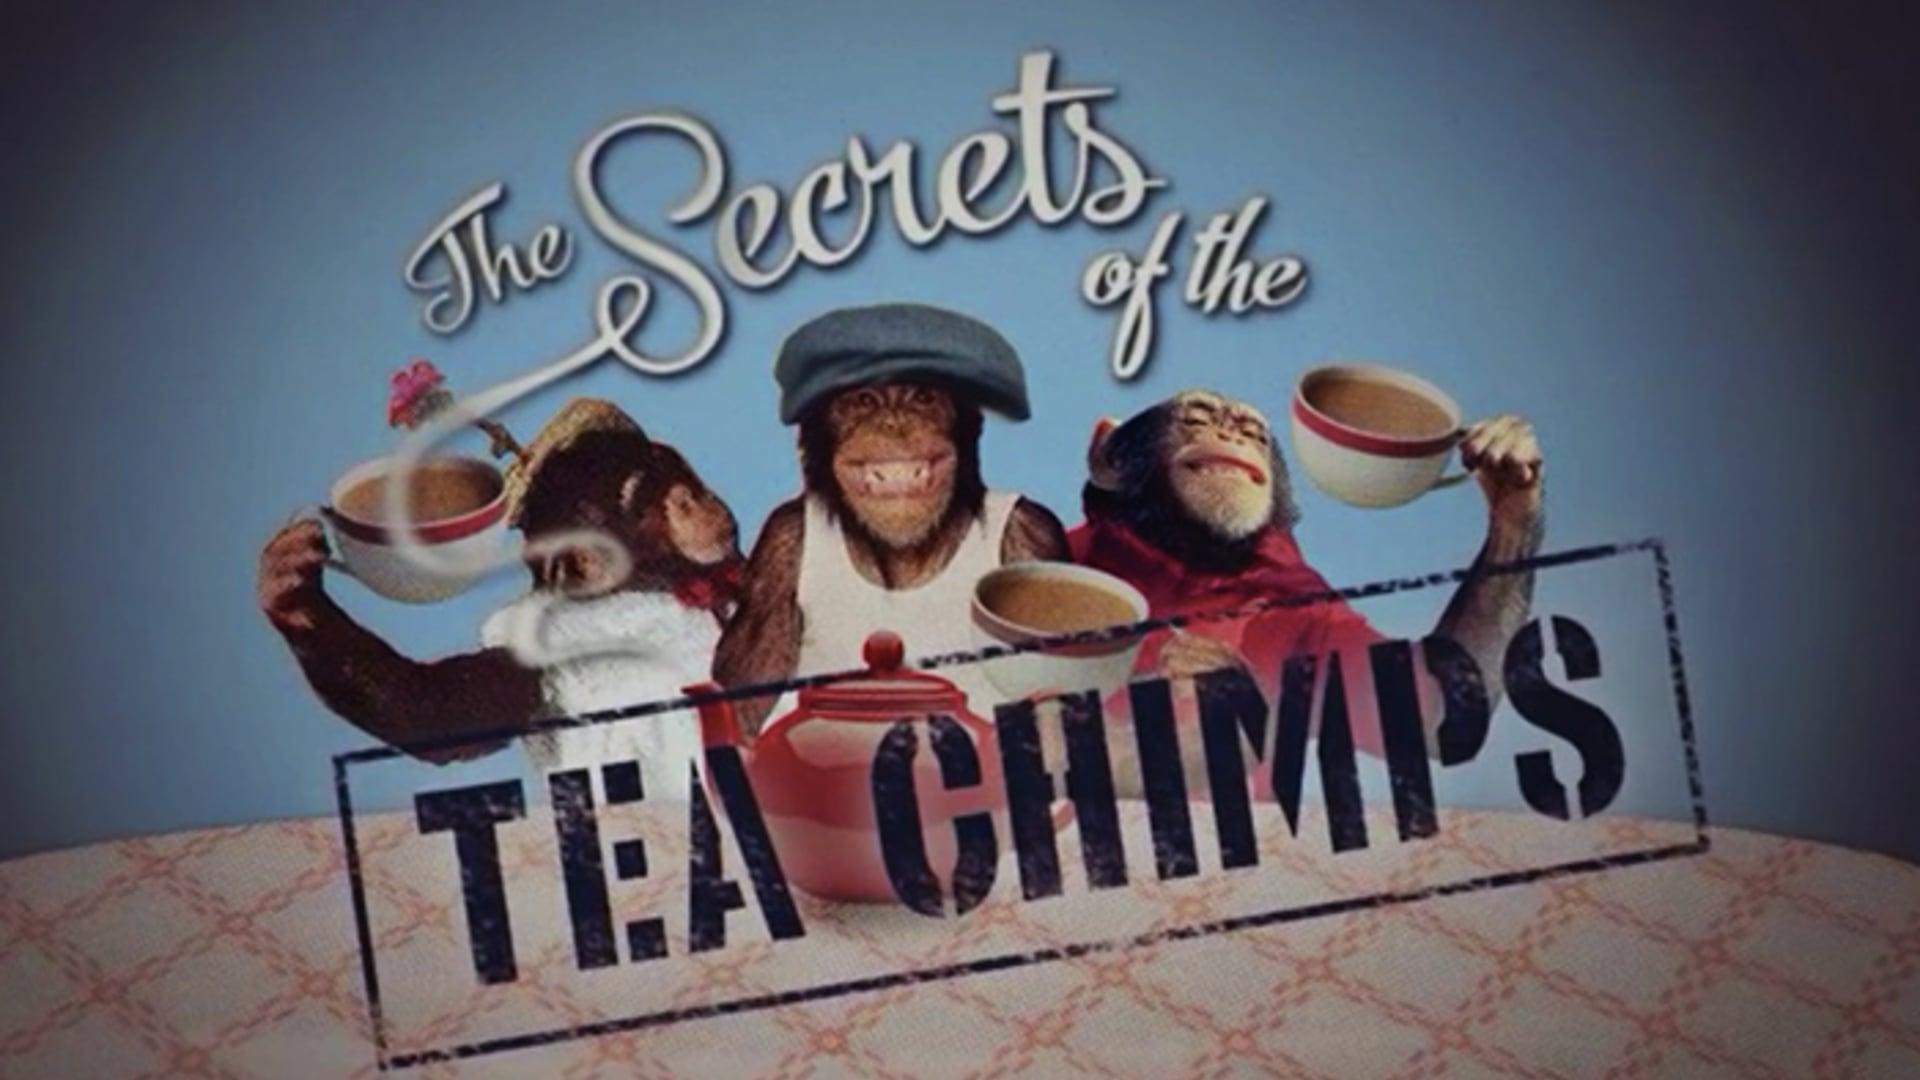 The Secrets of the Tea Chimps, Five